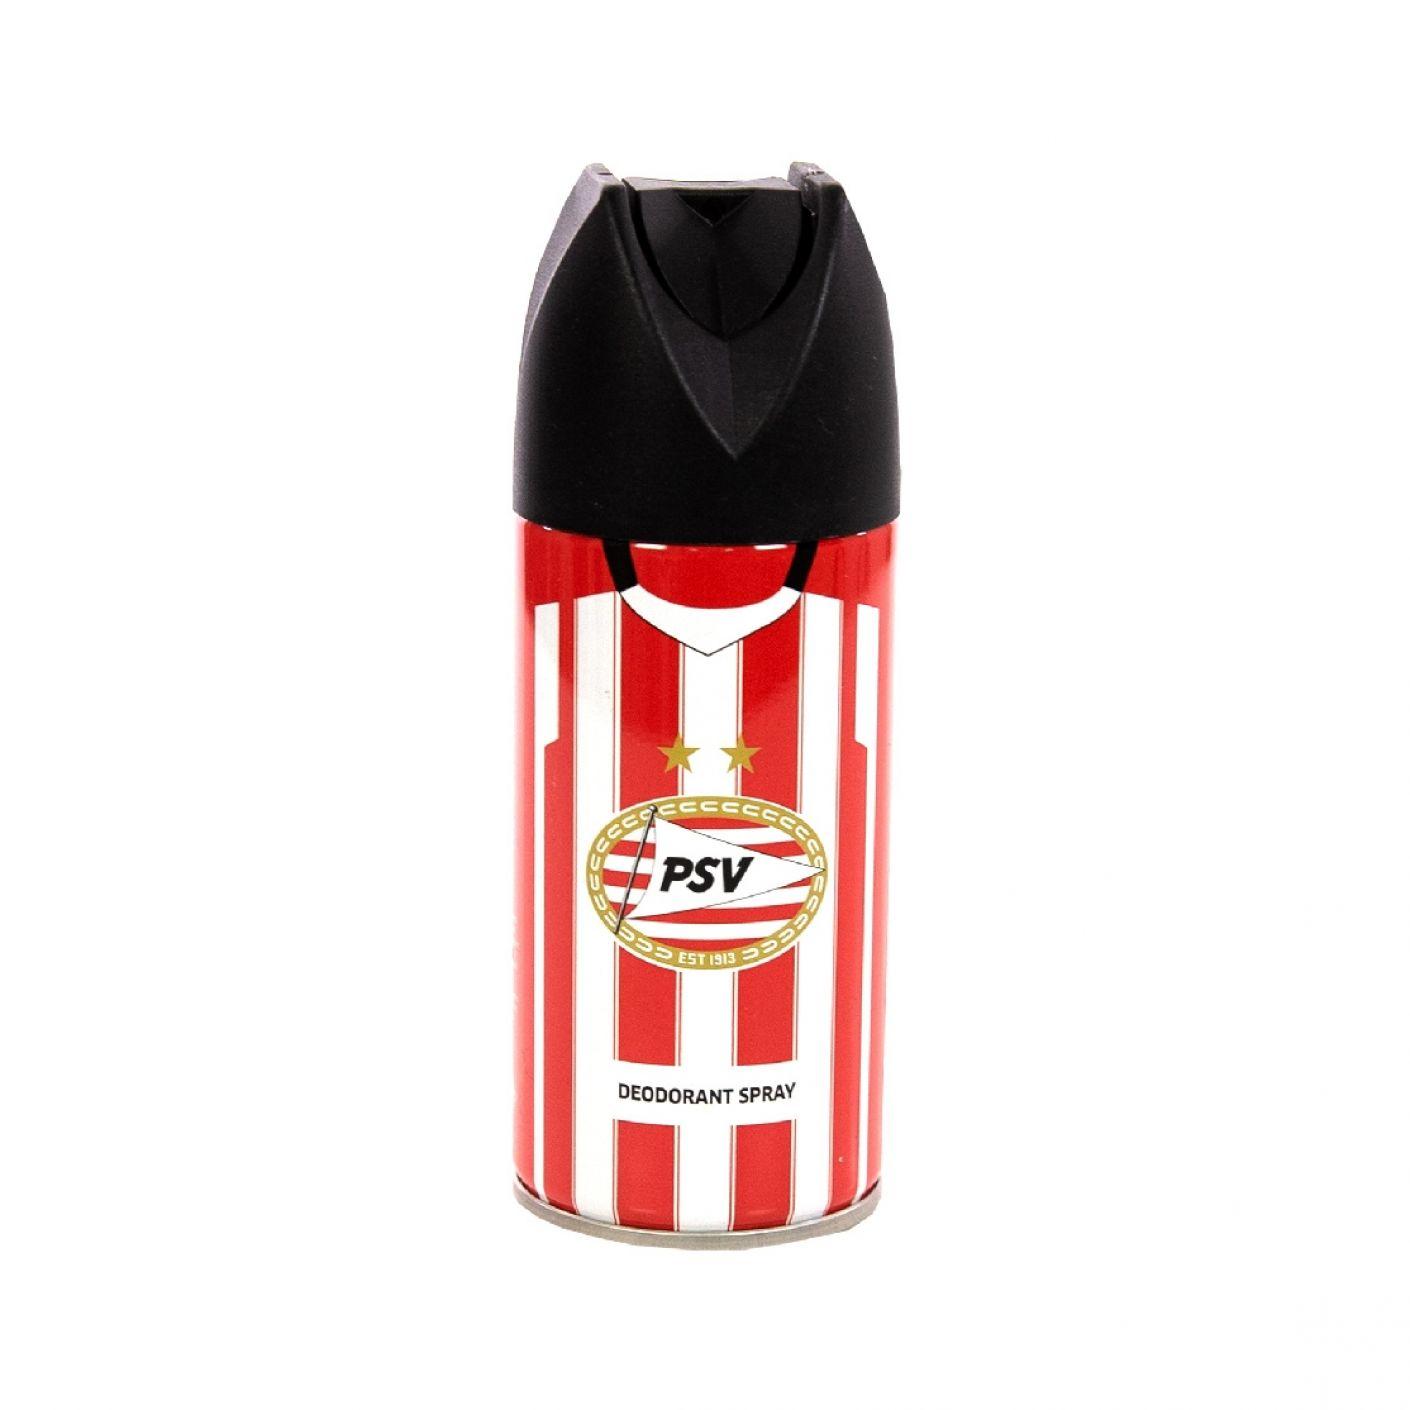 PSV Deodorant V-hals